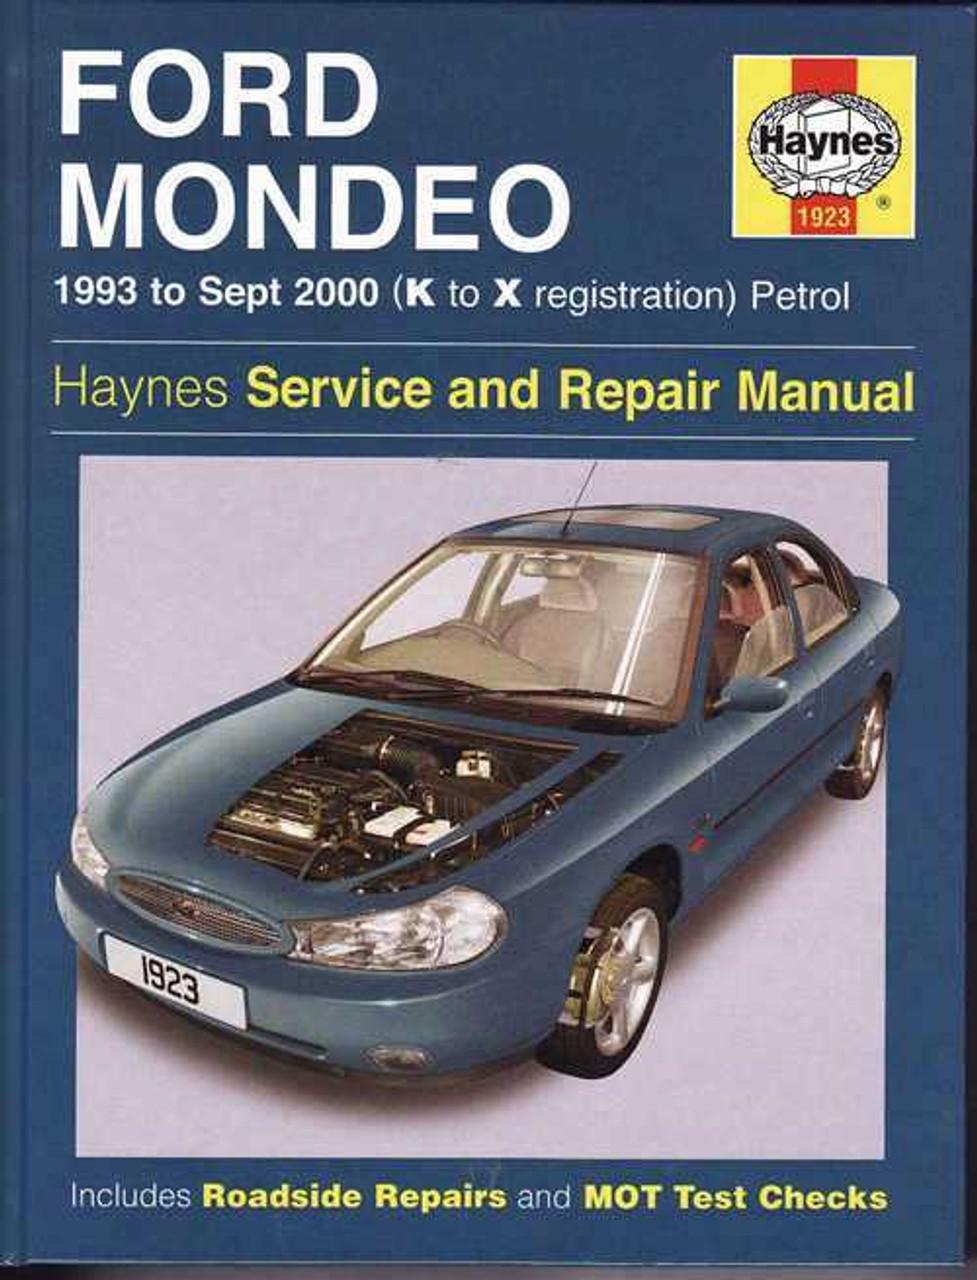 ford mondeo 1993 2000 workshop manual rh automotobookshop com au 2016 Ford Mondeo Ford Mondeo Trunk Space